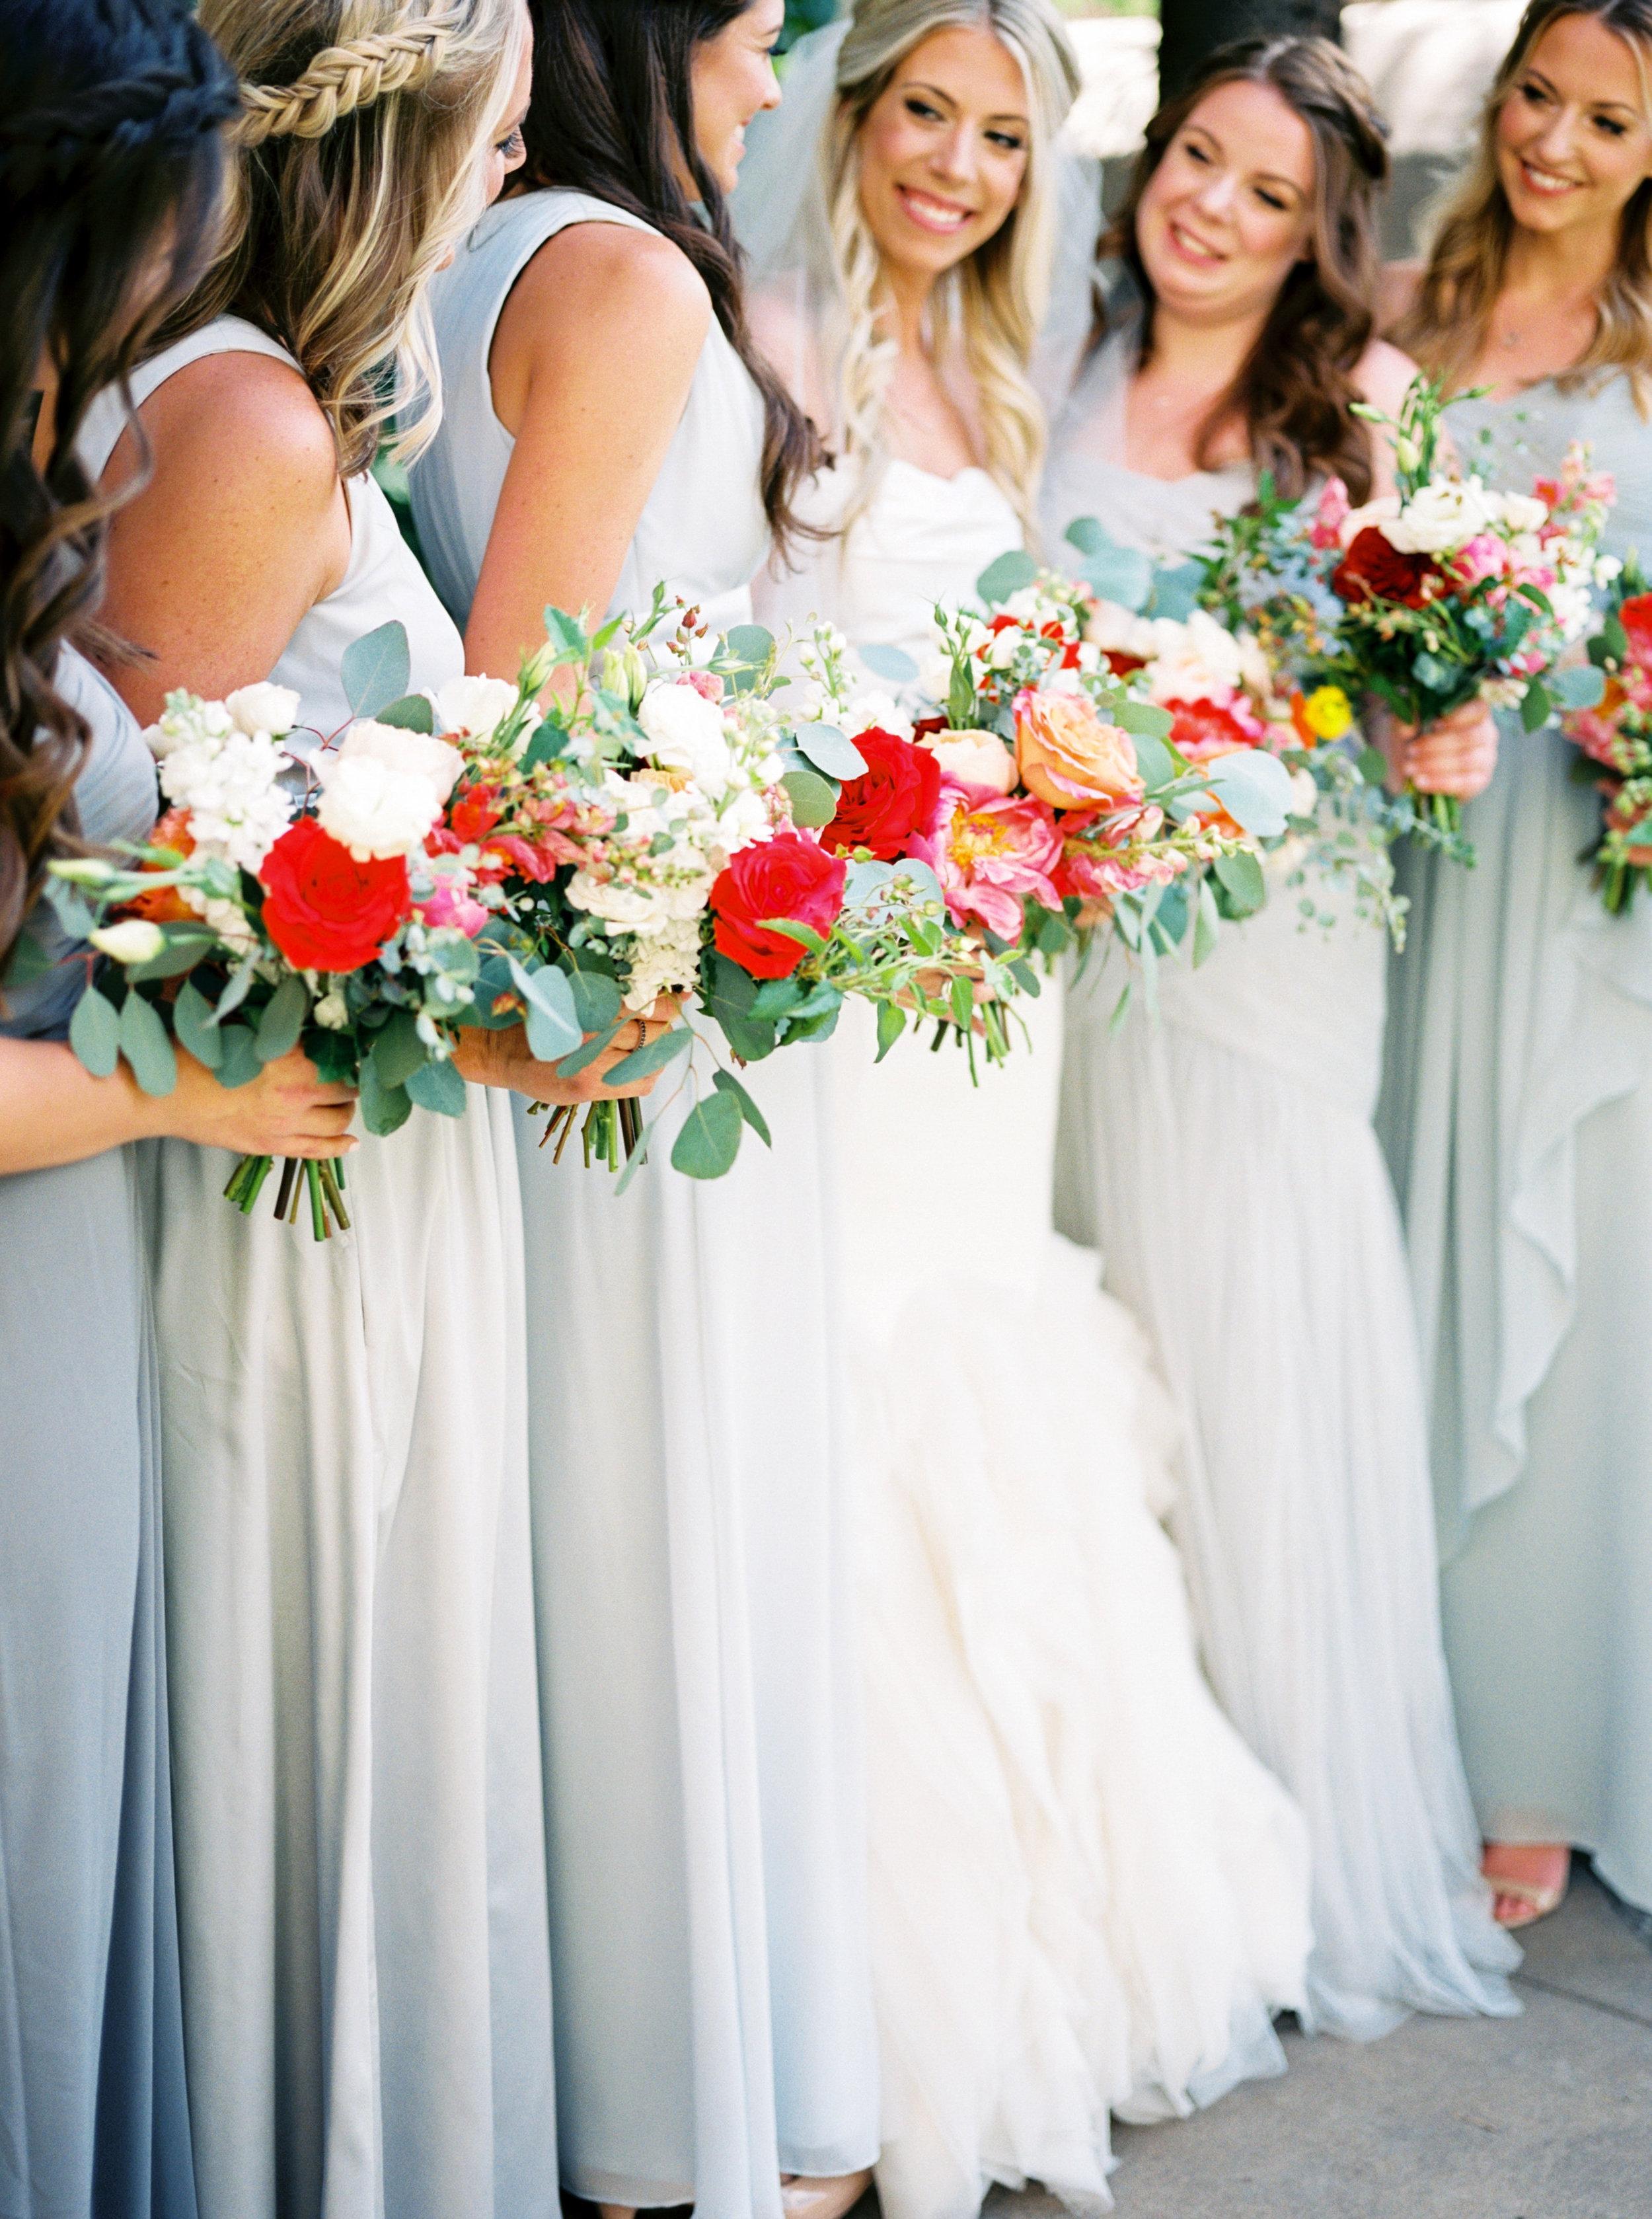 1-Scottsdale-wedding-planner-0040.jpg